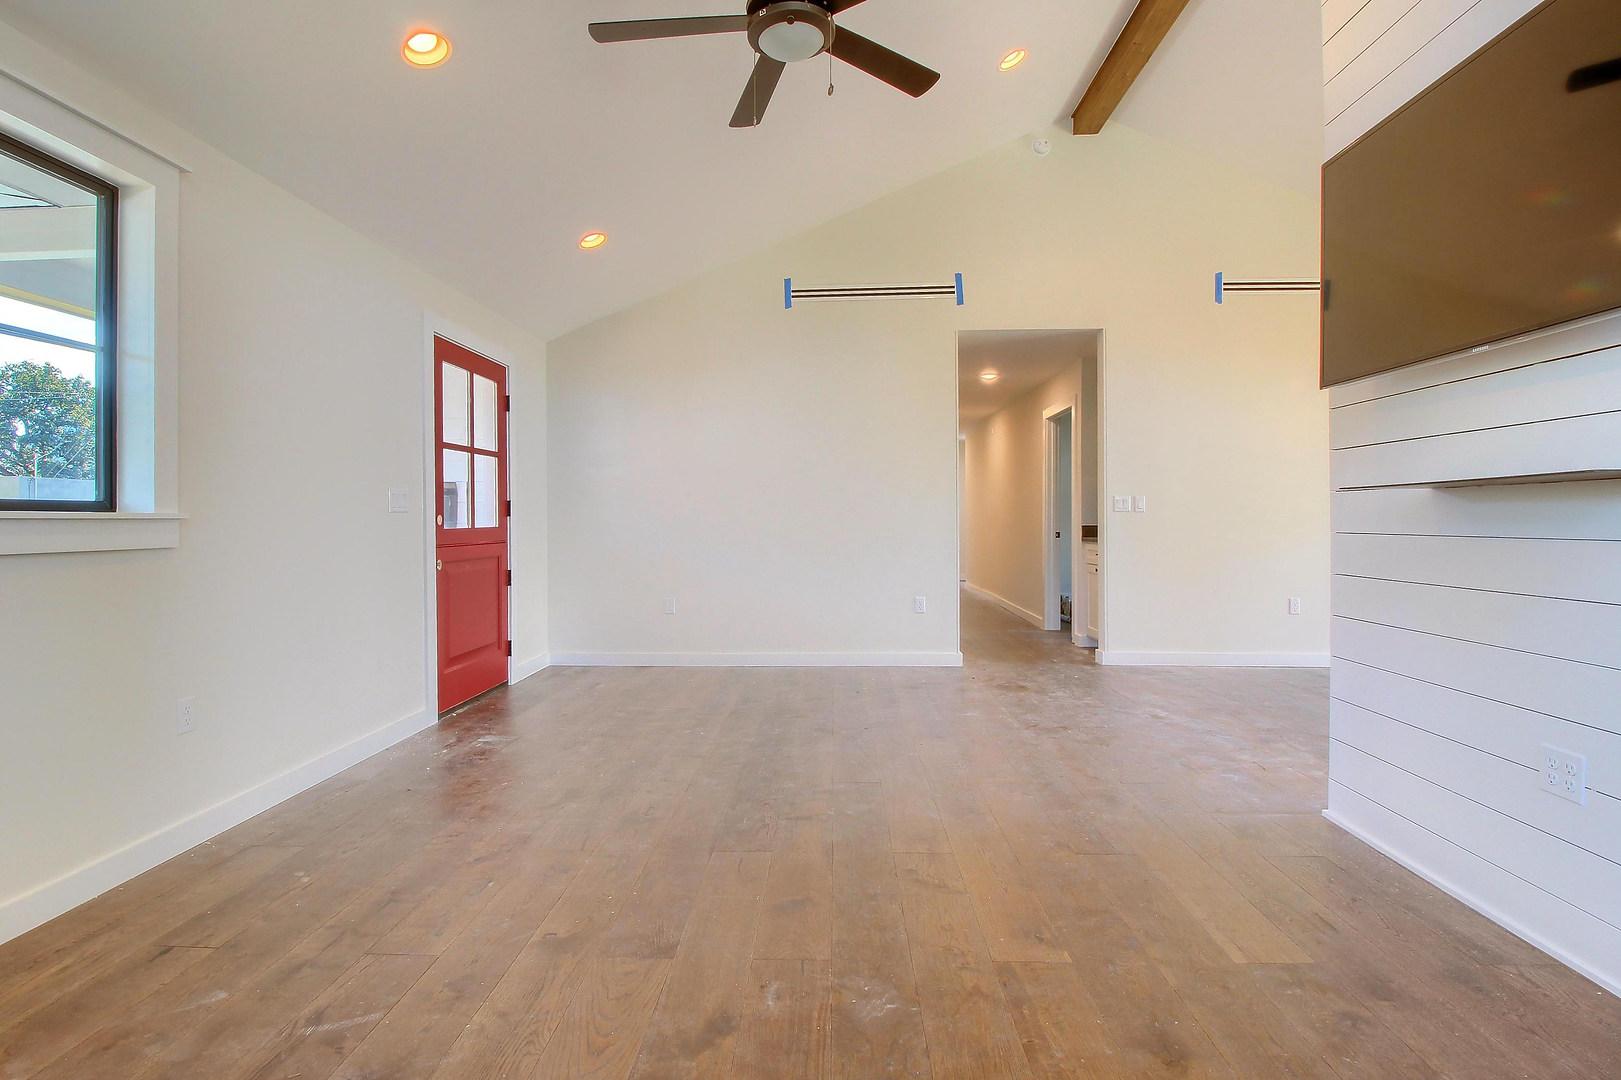 Home Renovation Open Floor Plan on Bouldin in Austin, TX